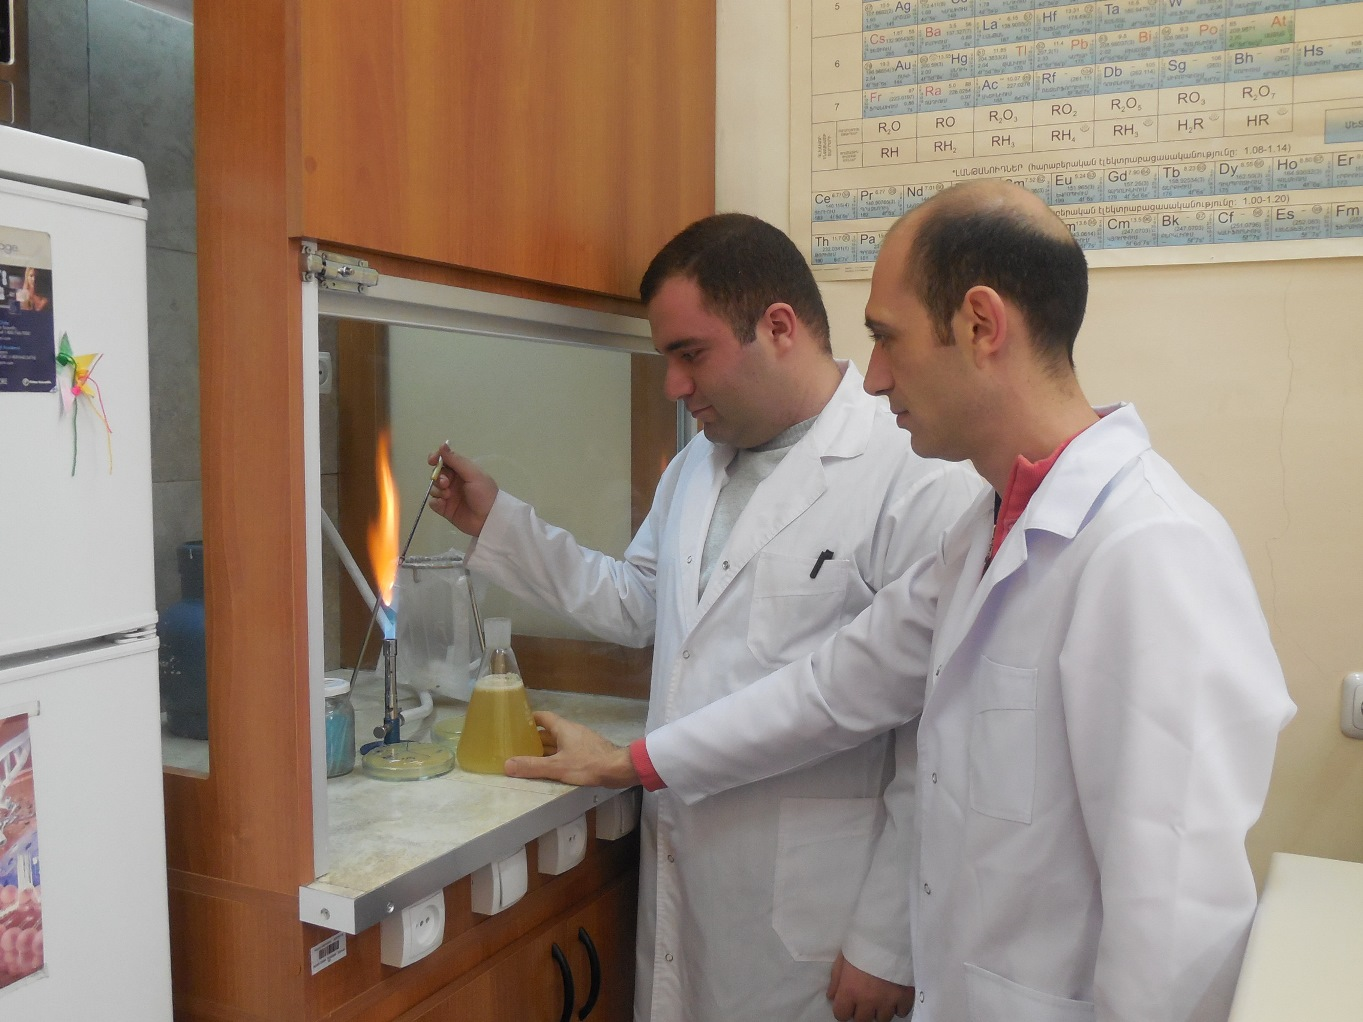 ANSEF award biotech-3460